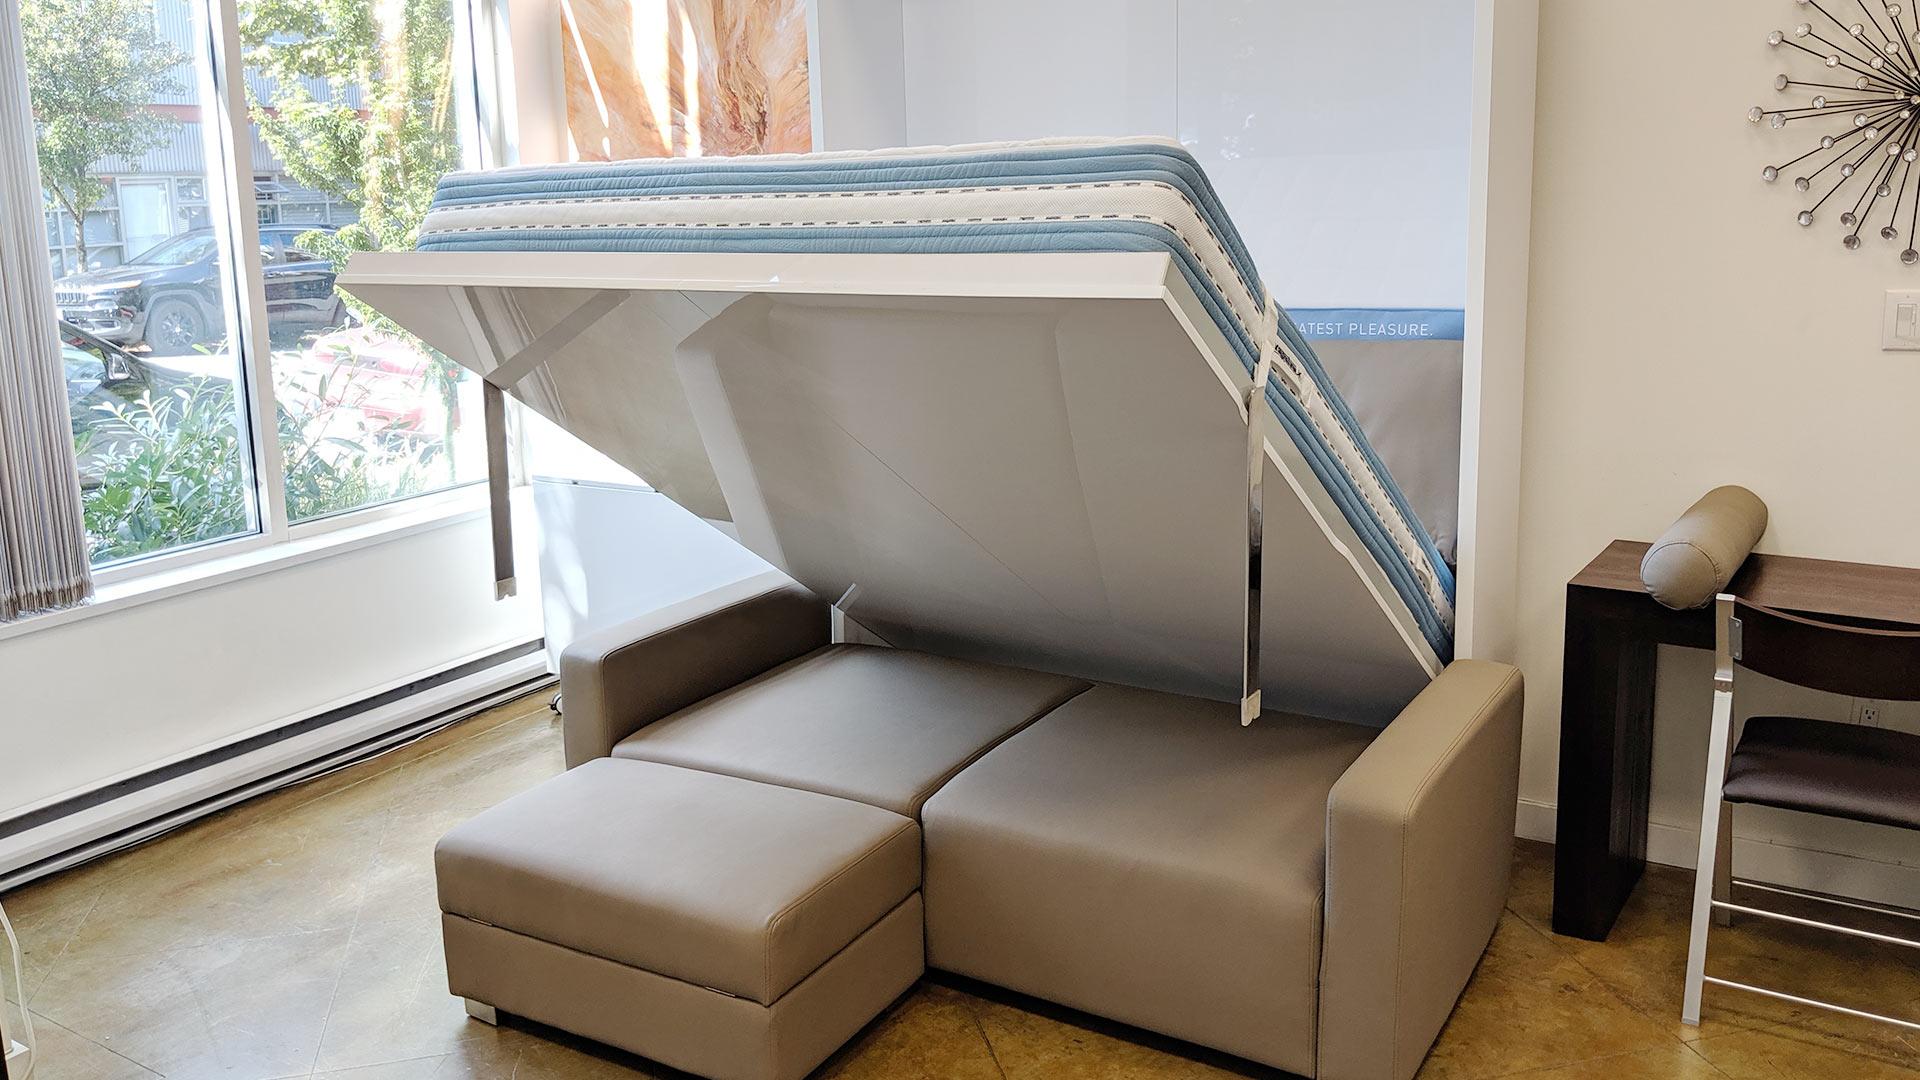 Murphysofa Minima Queen In Eco Leather Expand Furniture